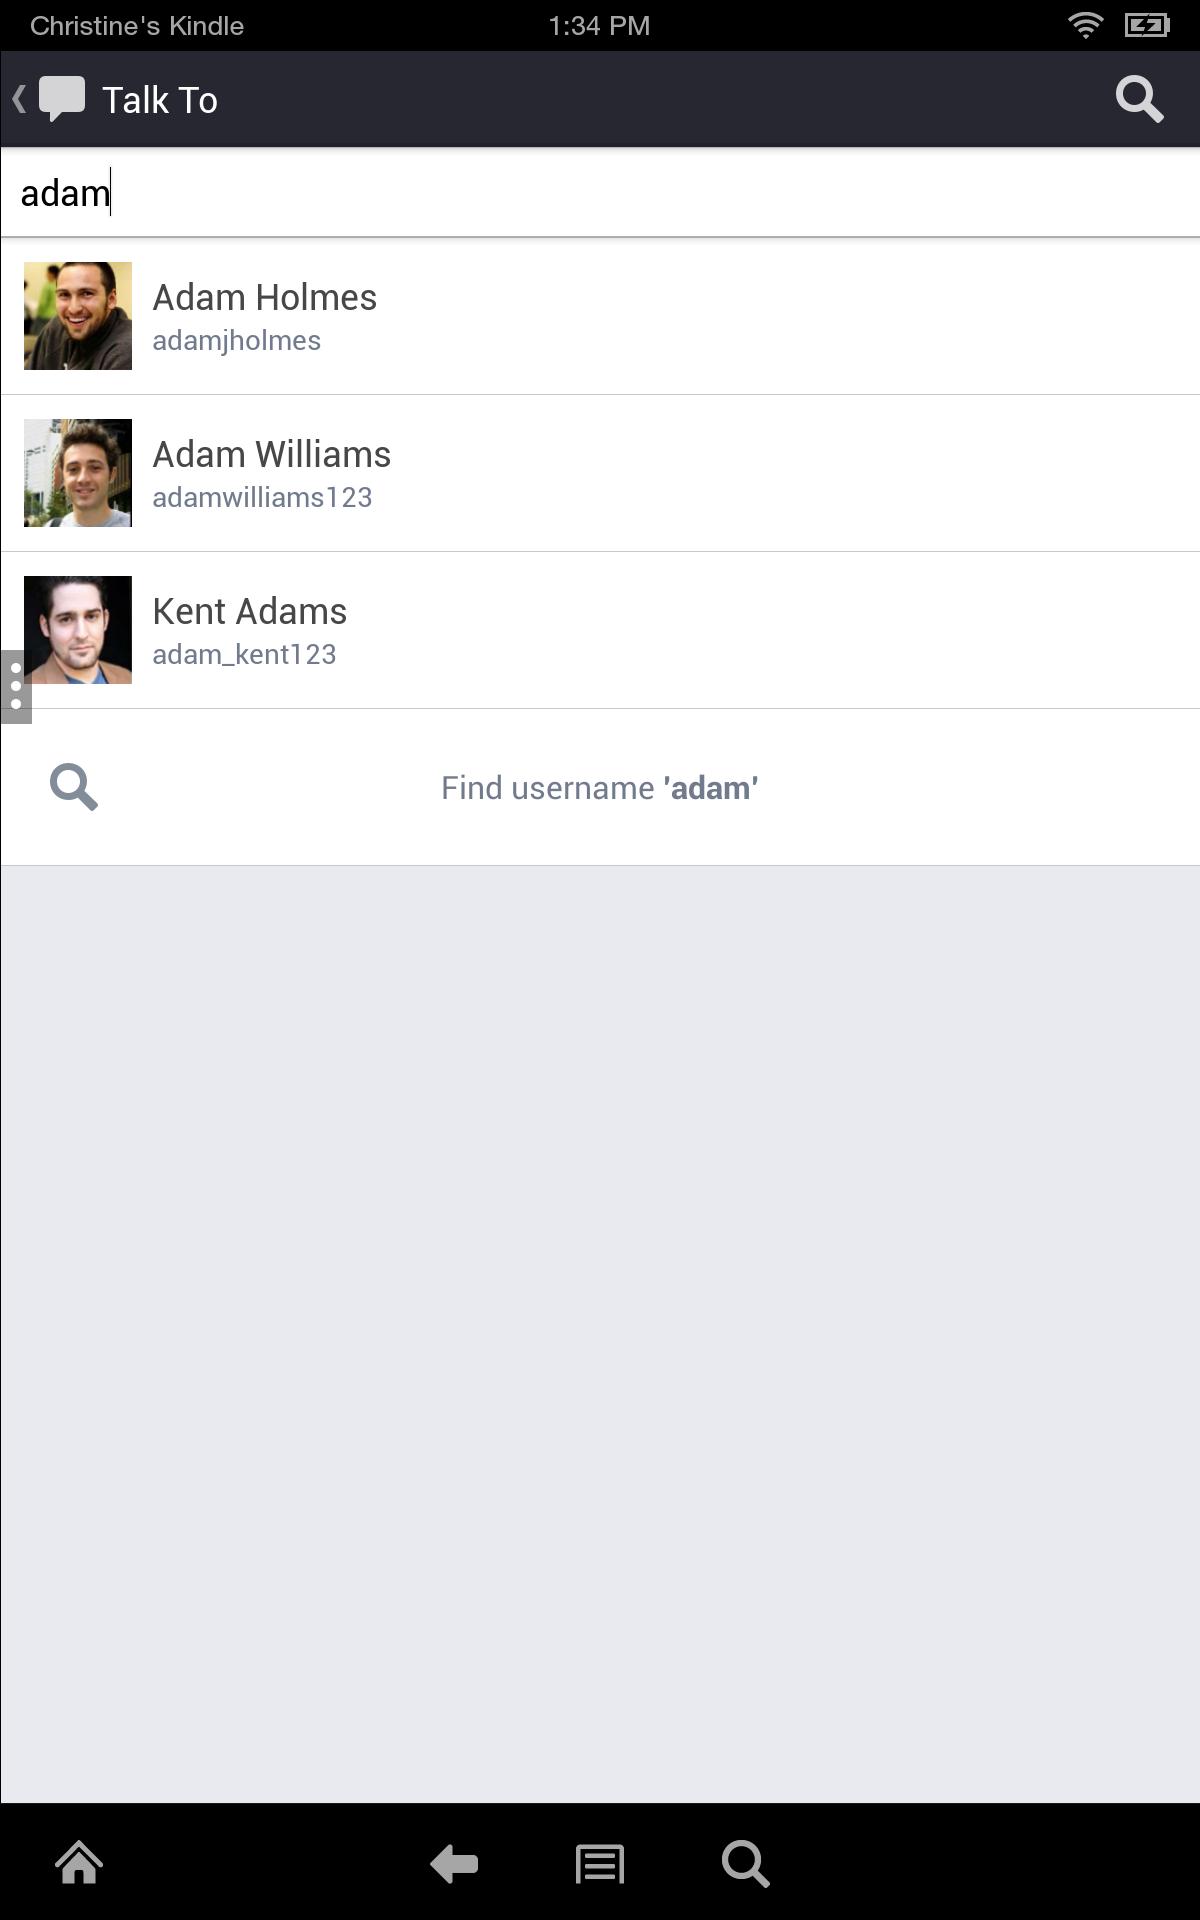 prodotti erotici flirt chat apps